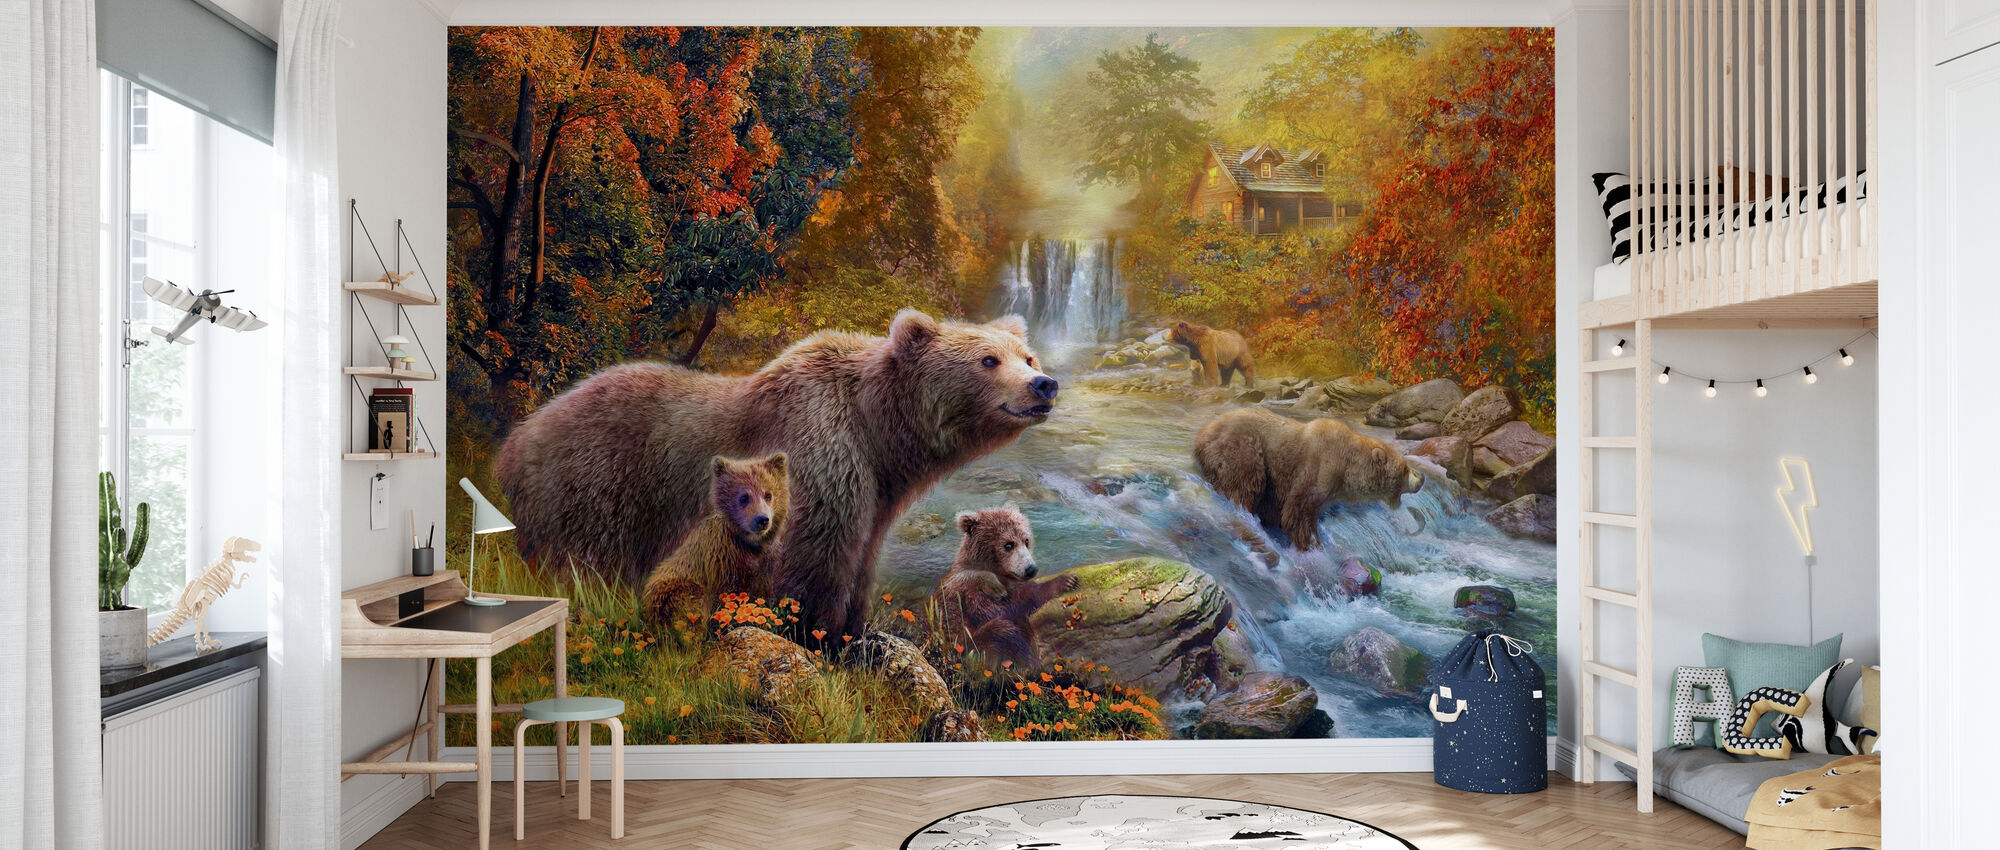 Bears by the Stream - Wallpaper - Kids Room